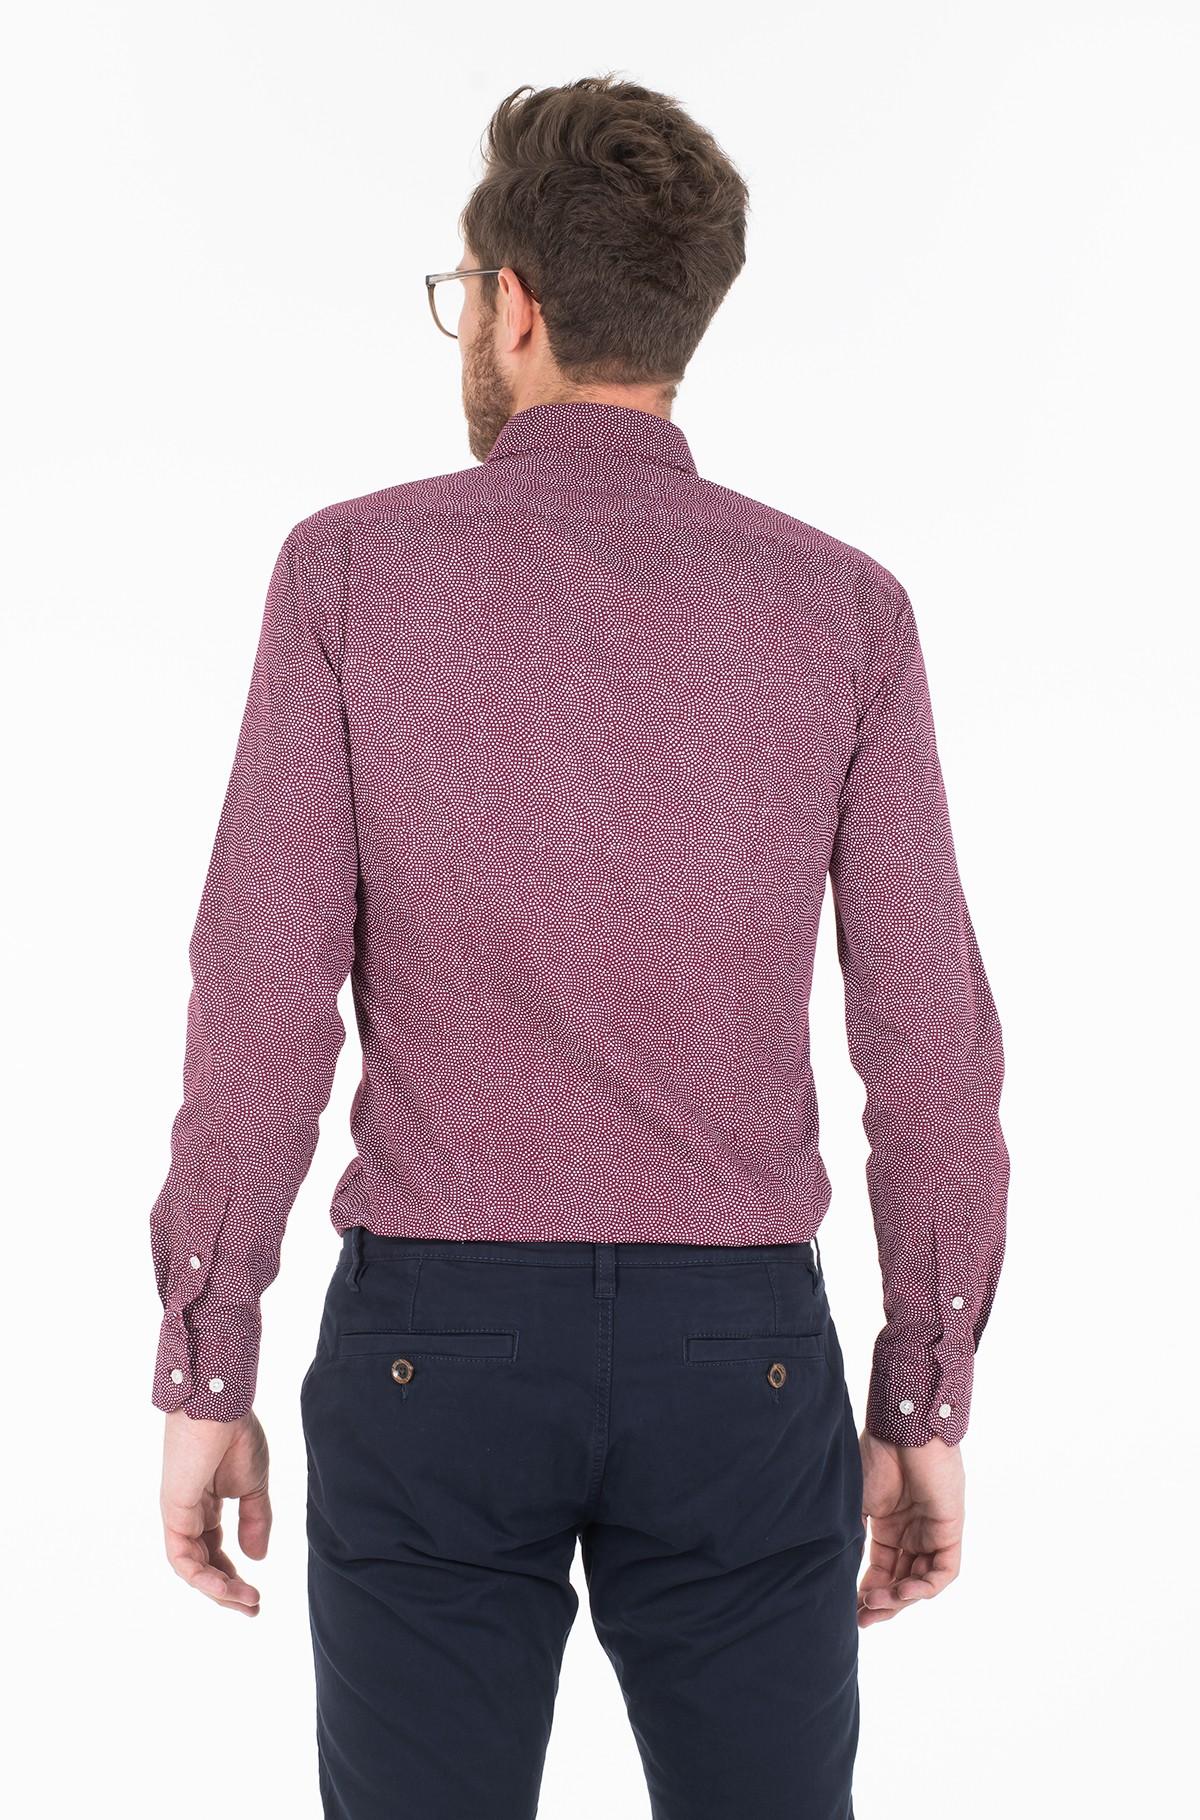 Marškiniai WASHED PRINT CLASSIC SLIM SHIRT-full-2